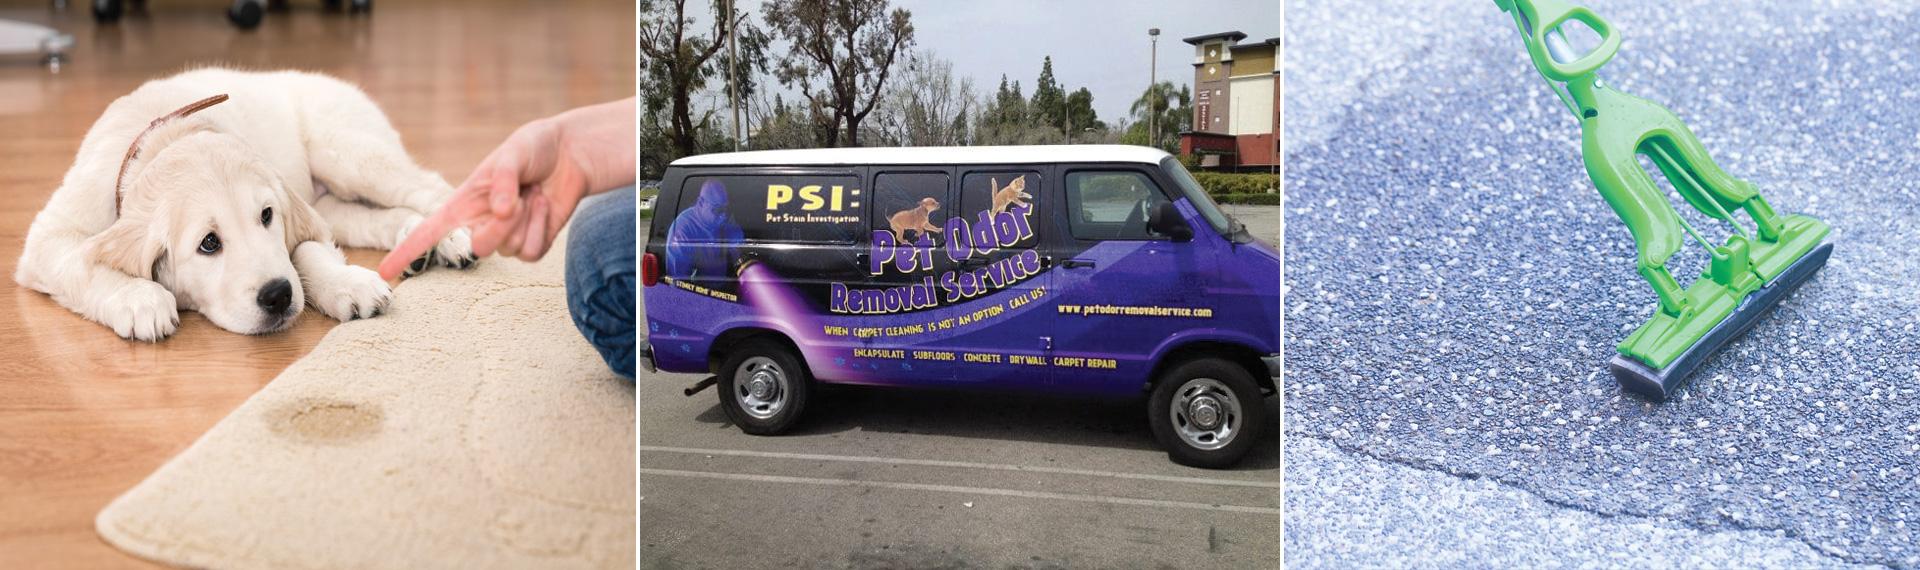 Pet Odor Removal Service San Clemente CA